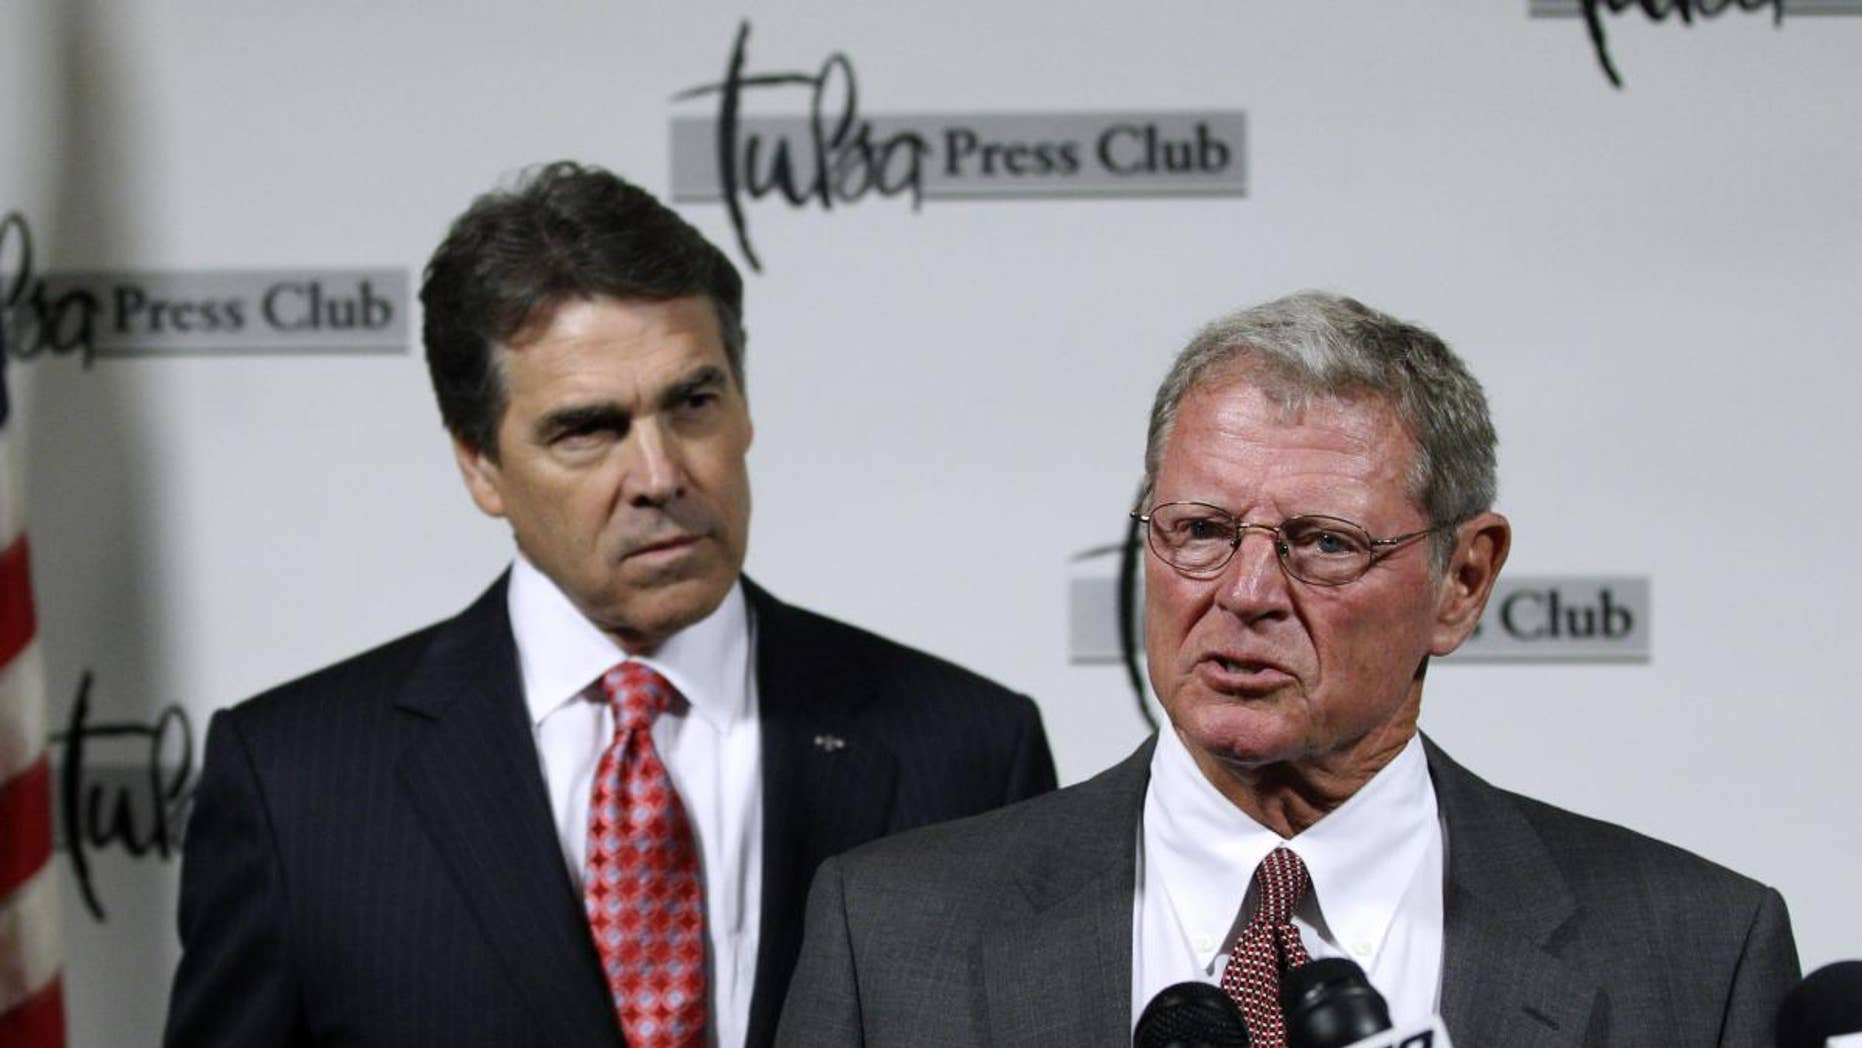 Sen. Jim Inhofe, R-Okla., right, introduces Republican presidential candidate, Texas Gov. Rick Perry, at a news conference in Tulsa, Okla., Monday, Aug. 29, 2011. (AP Photo/Sue Ogrocki)